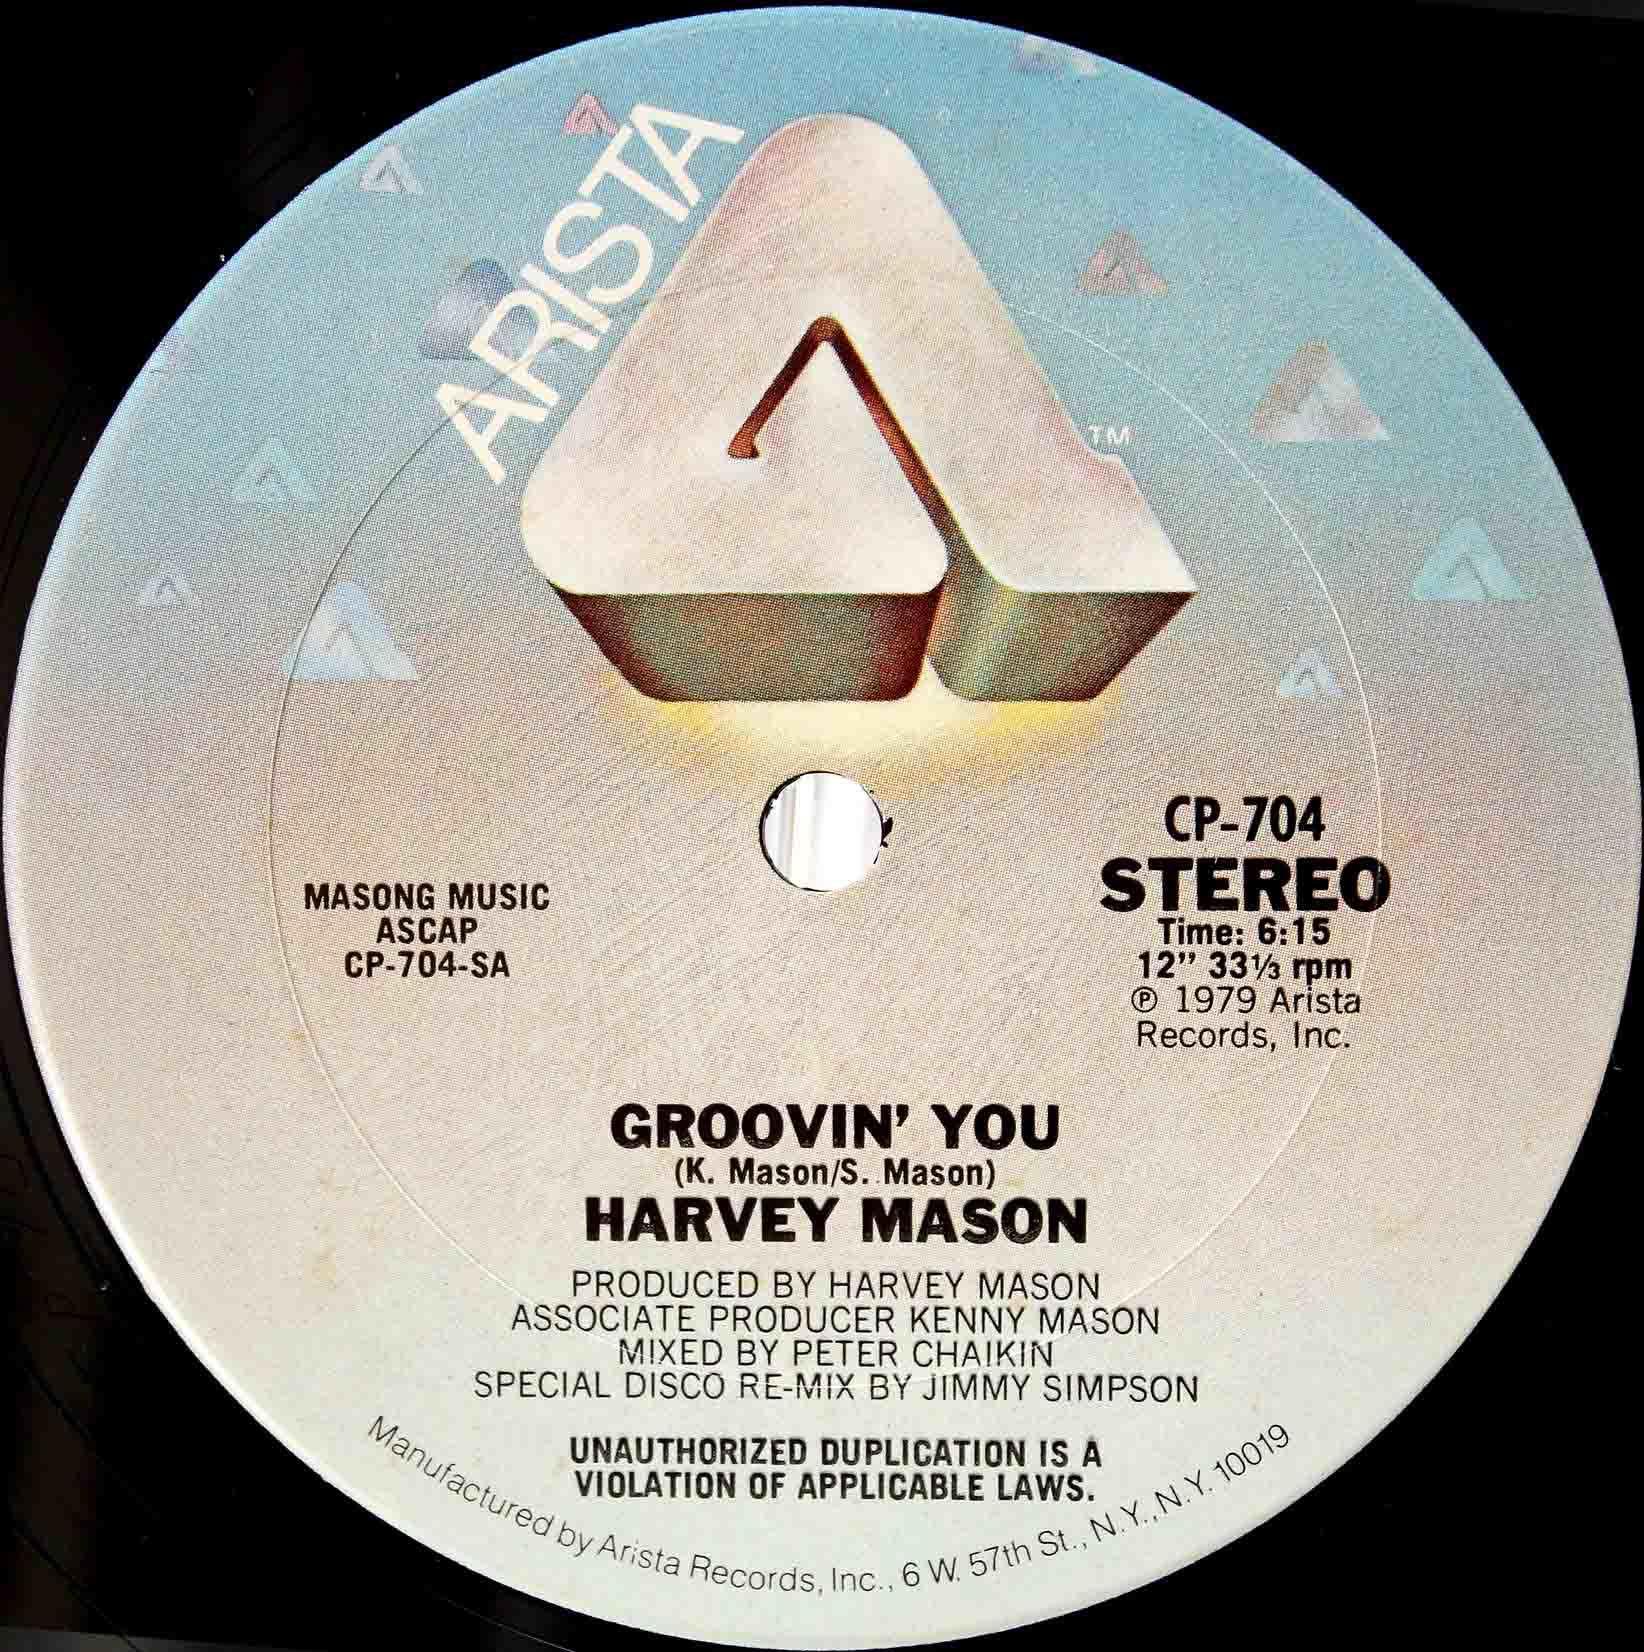 Harvey Mason - Groovin You 03